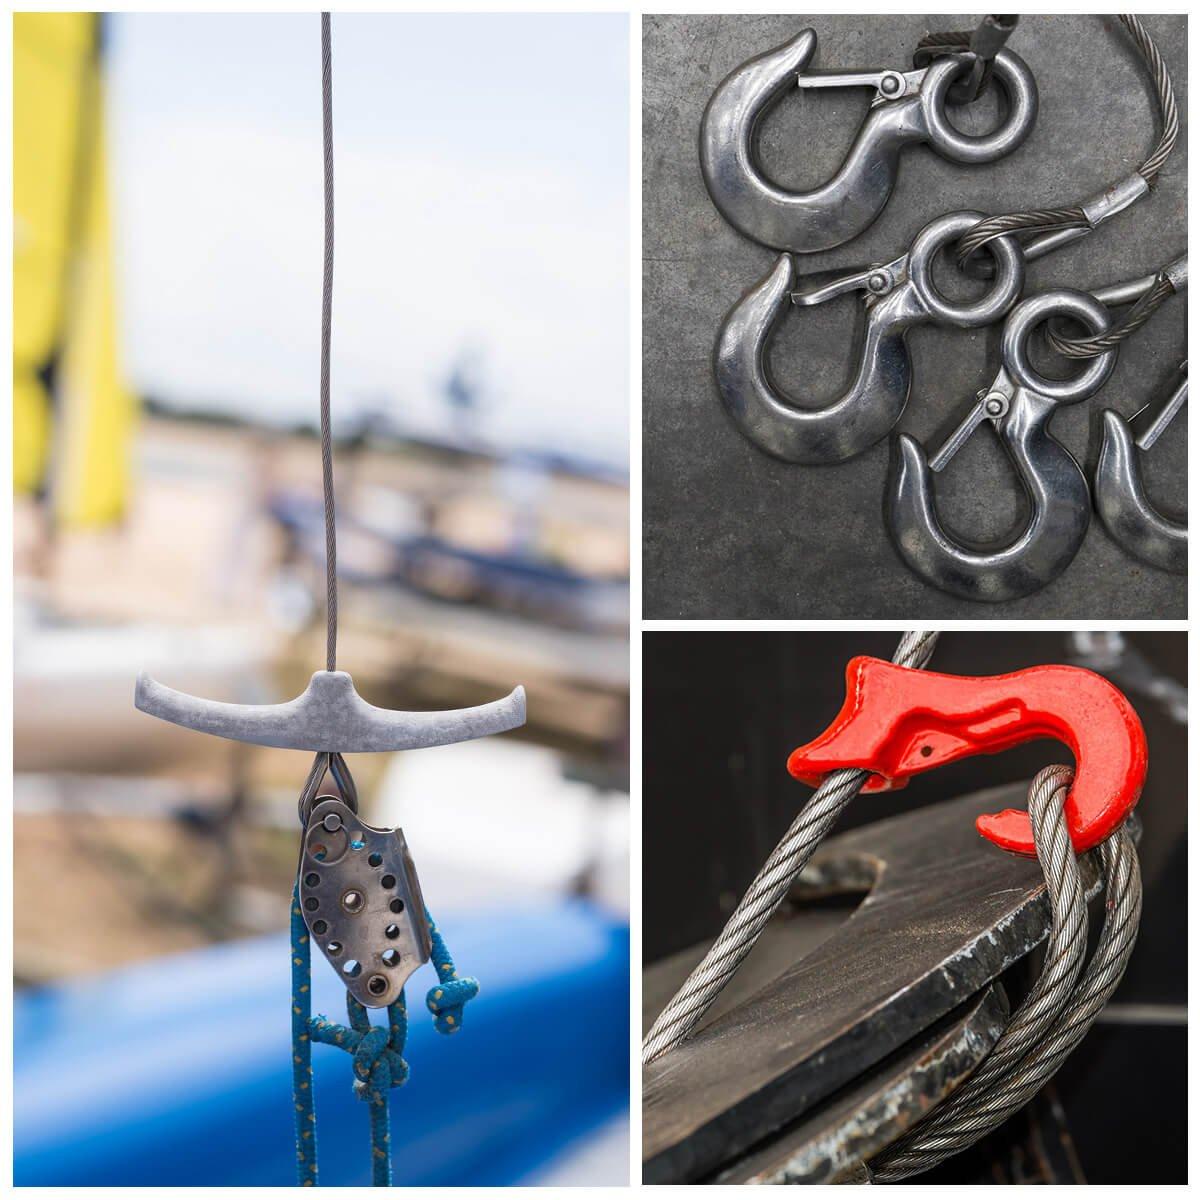 Seilwerk STANKE 25m 3mm Drahtseil 6x7 verzinkt Stahlseil Forstseil DIN Windenseil Seil Draht Stahl